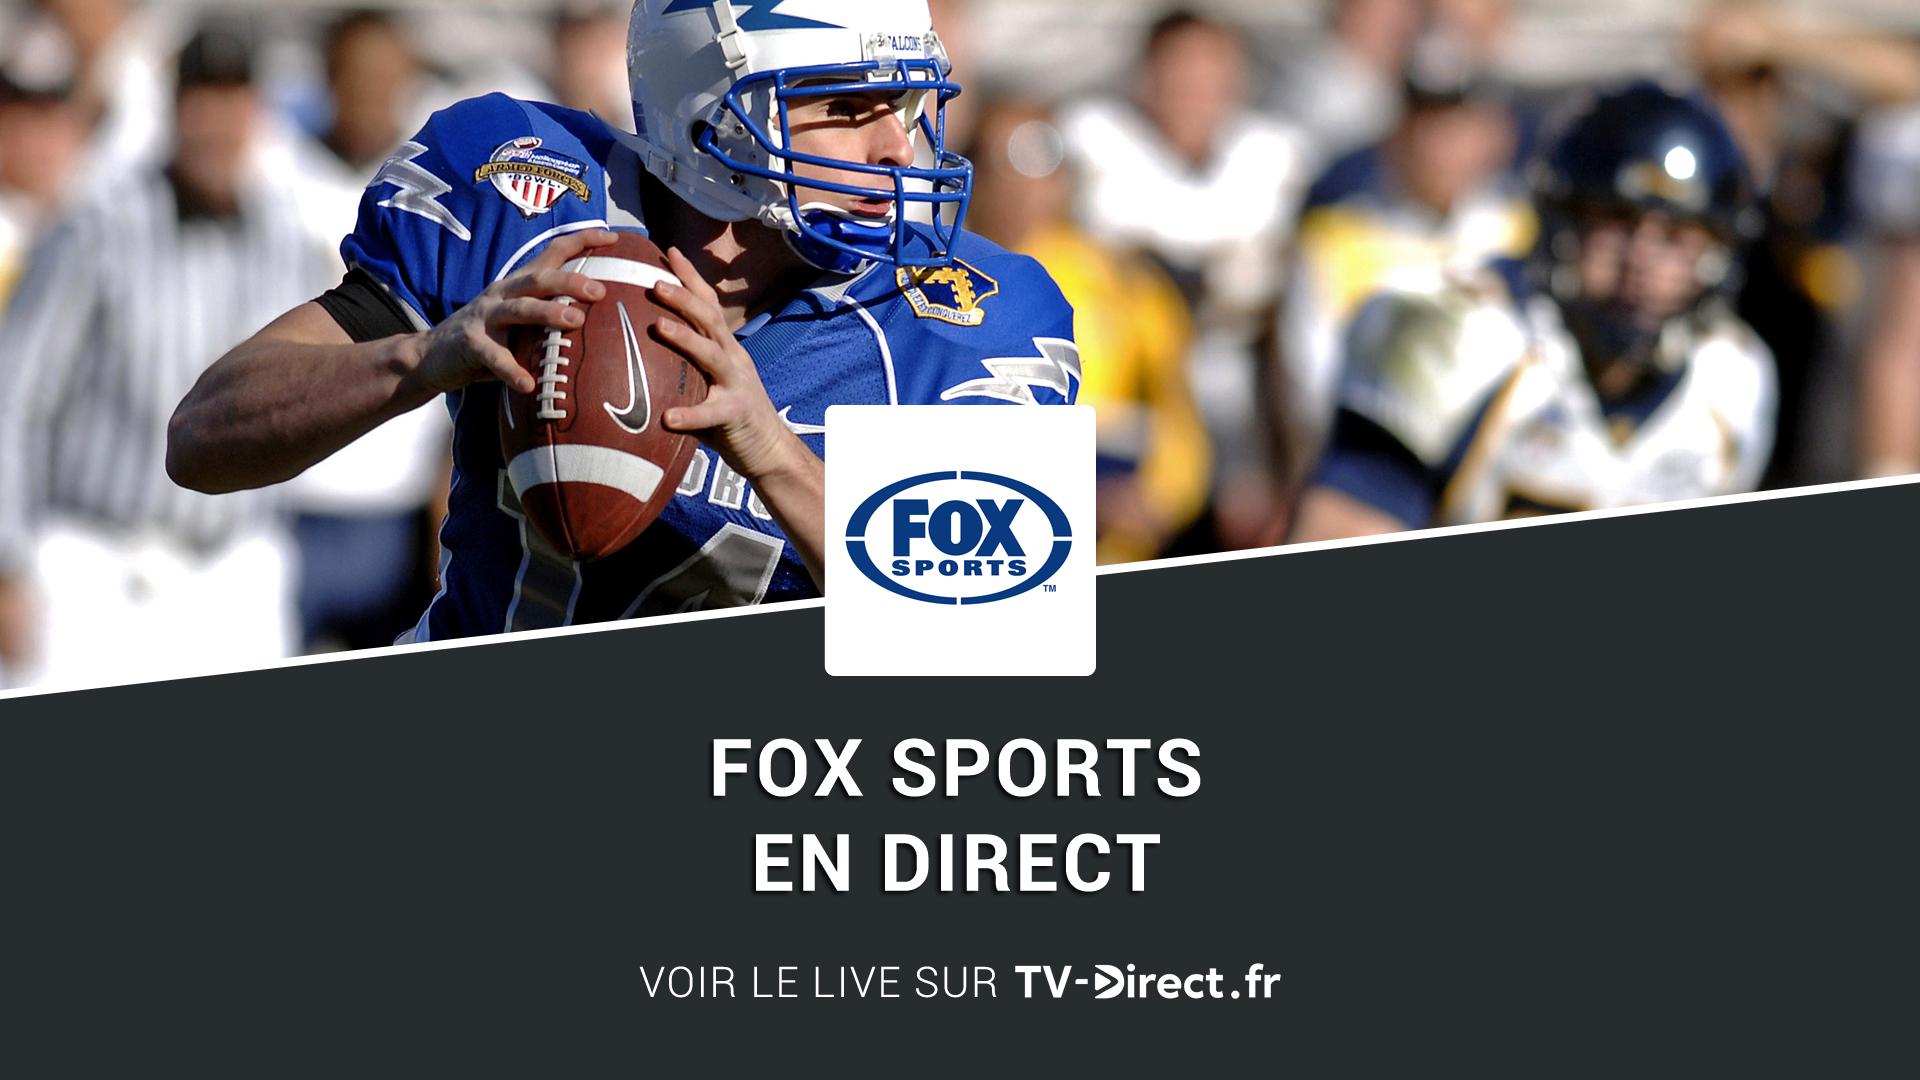 fox sports direct regarder fox sports live sur internet. Black Bedroom Furniture Sets. Home Design Ideas